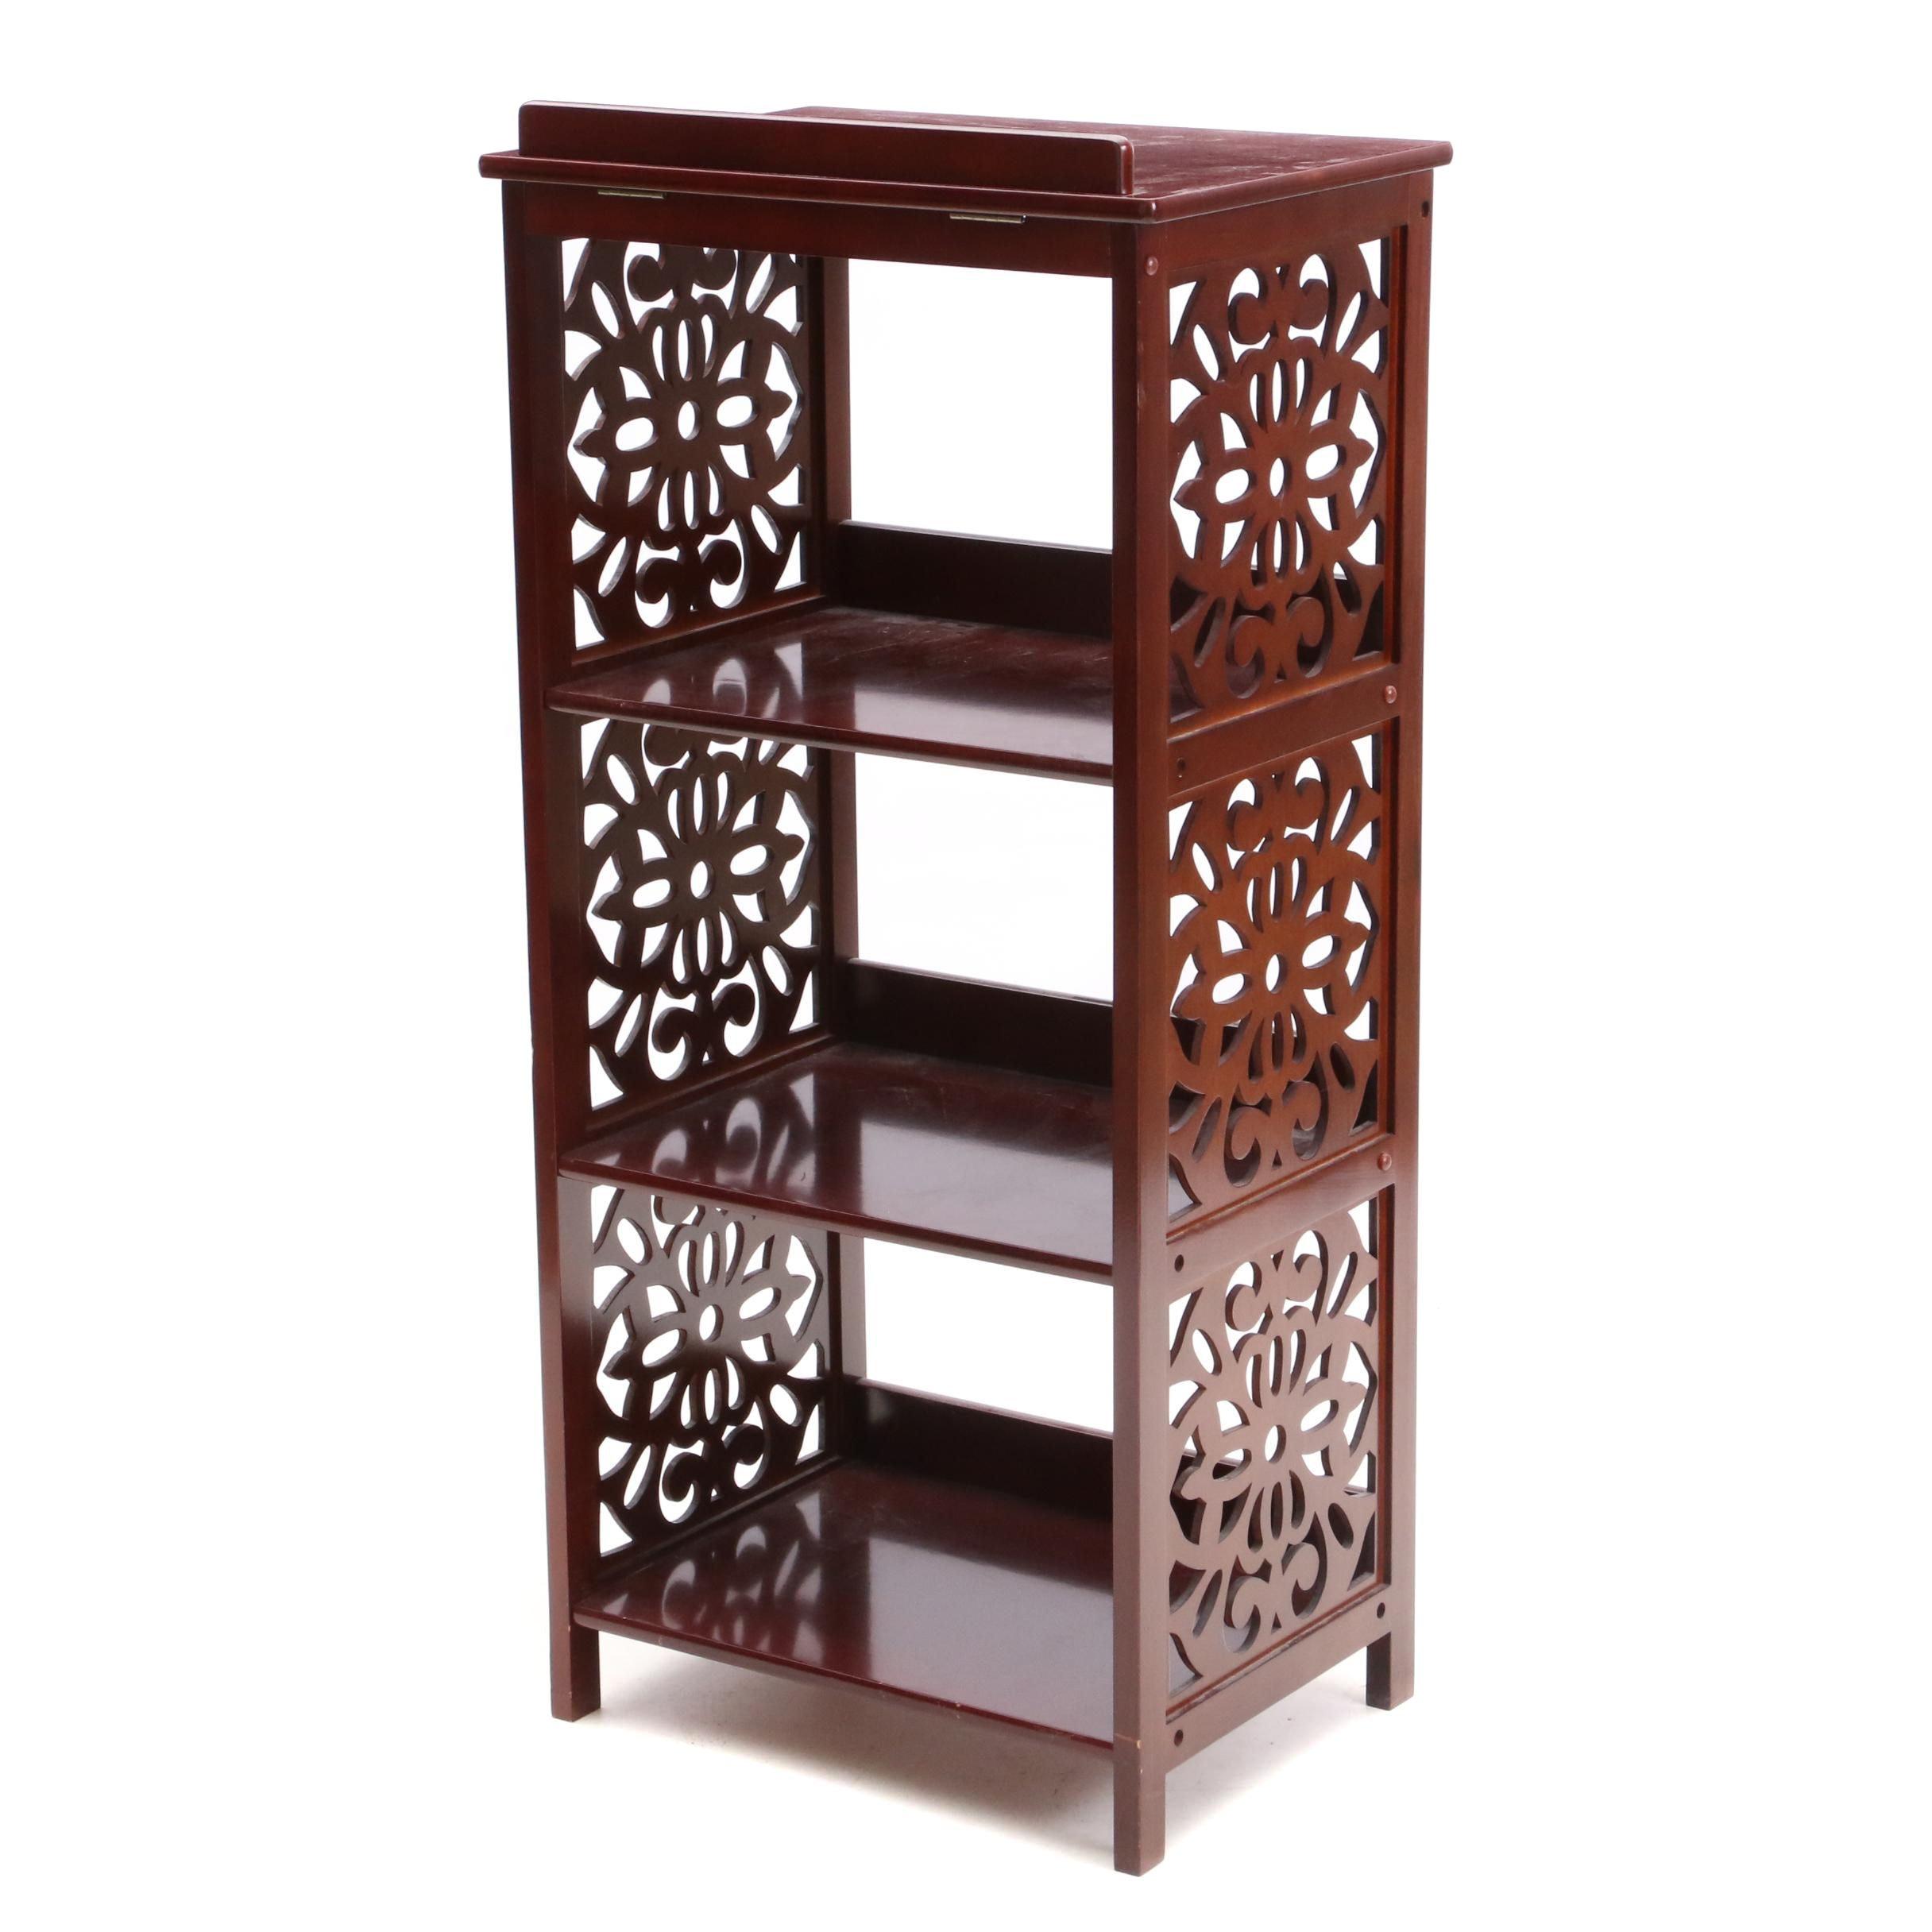 Freestanding Open Shelf Bookcase